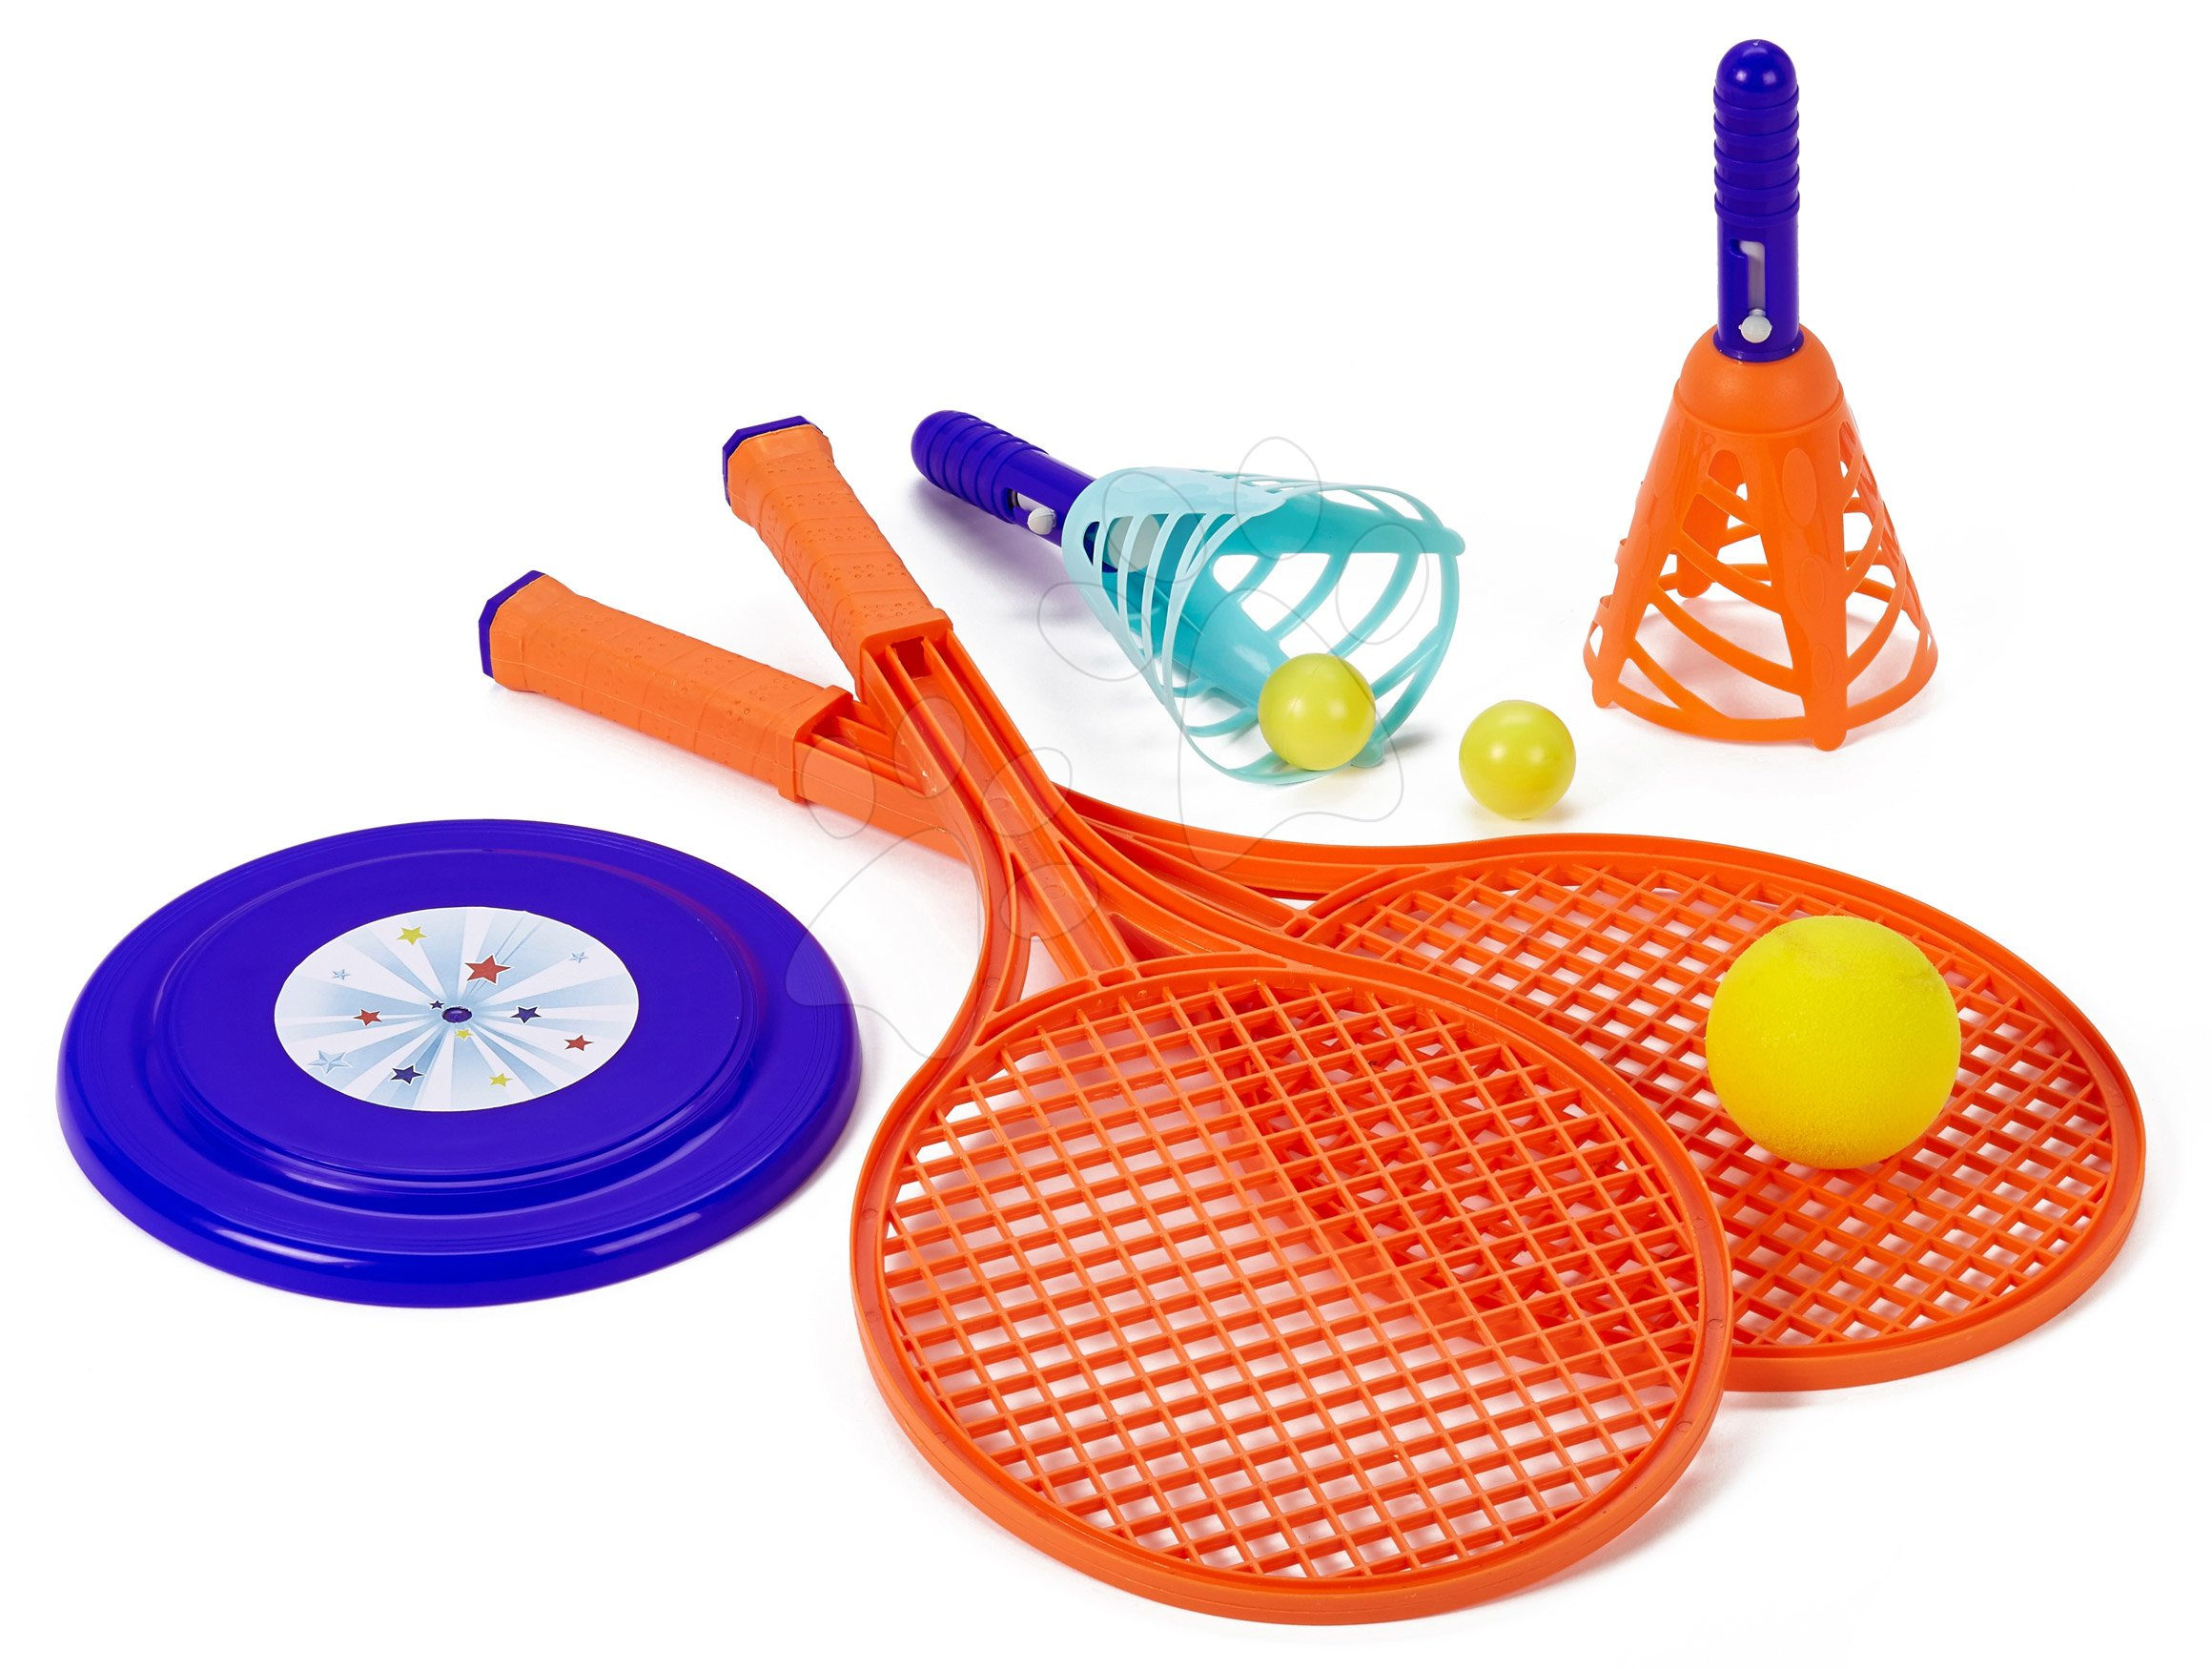 Tenis veľká sada Sport Écoiffier s lietajúcim tanierom a hra s loptičkami 55 cm od 18 mes